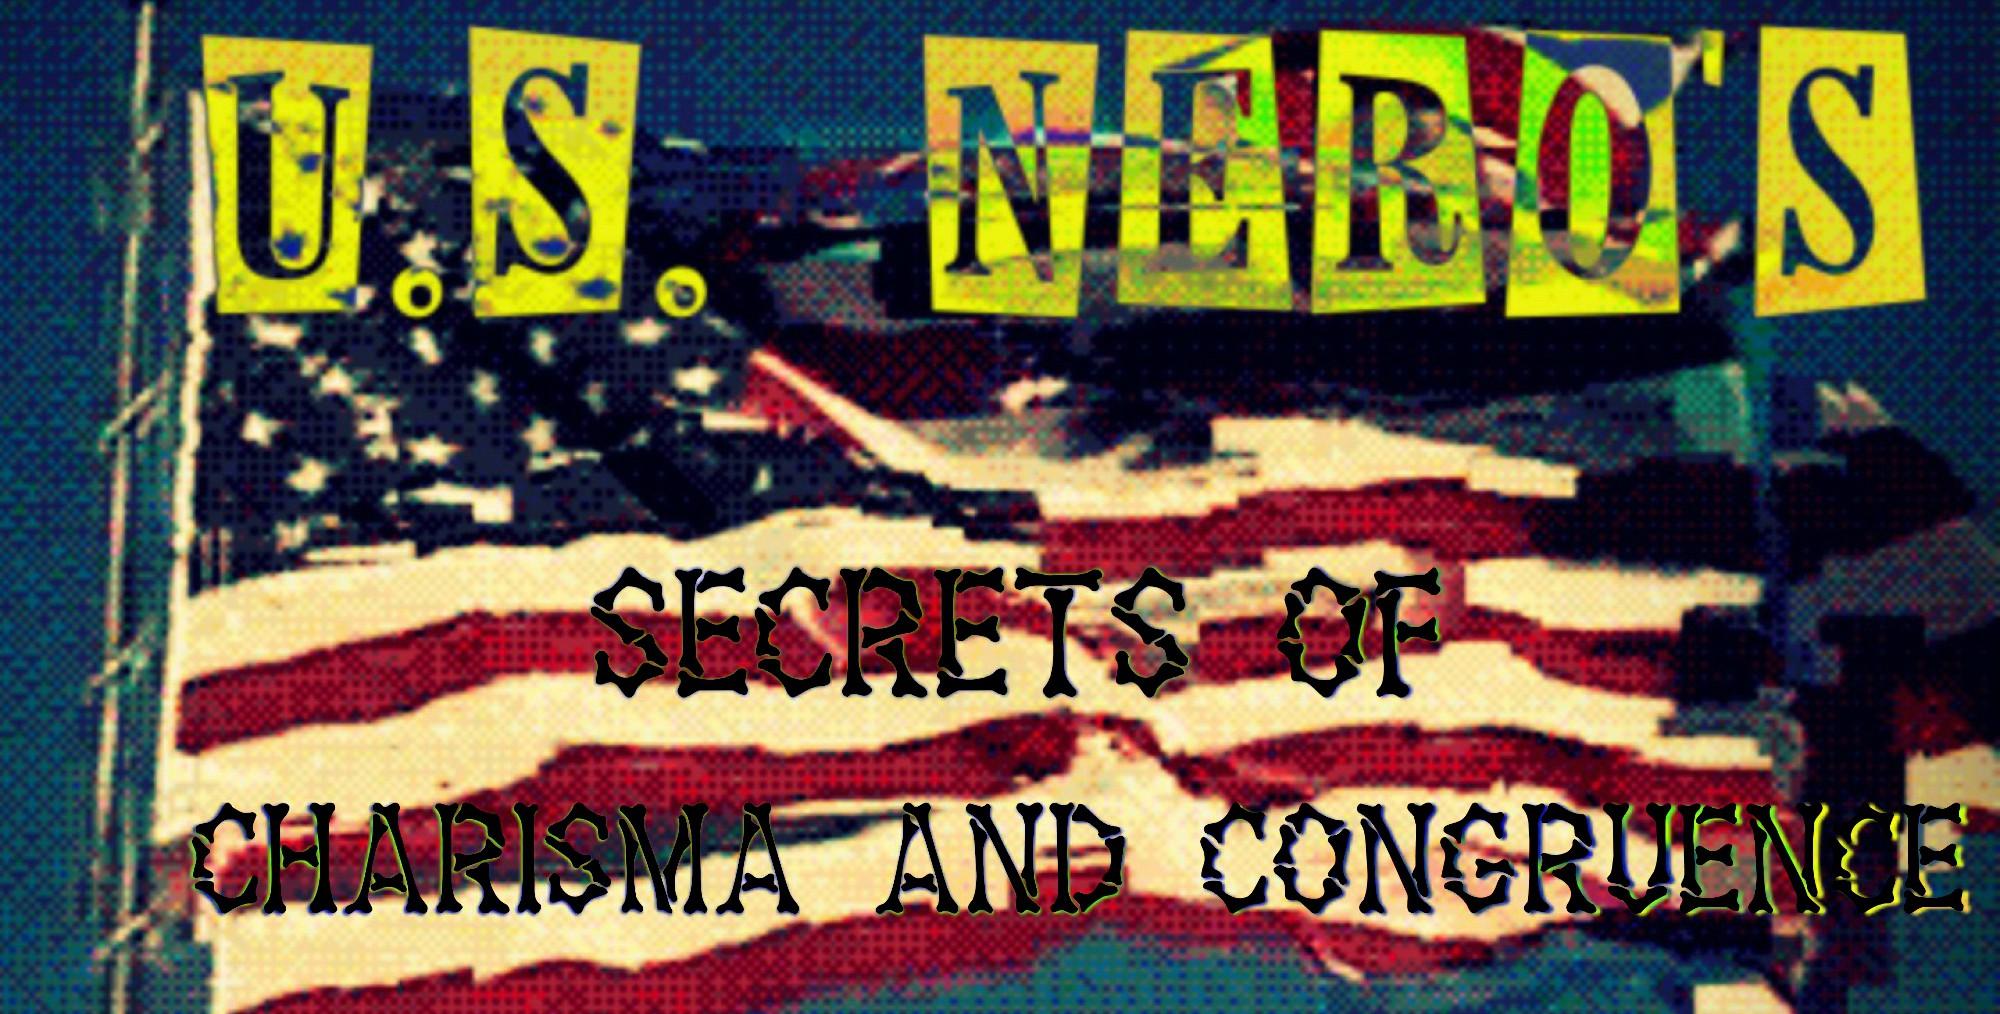 U.S. Nero's Secrets of Charisma and Congruence